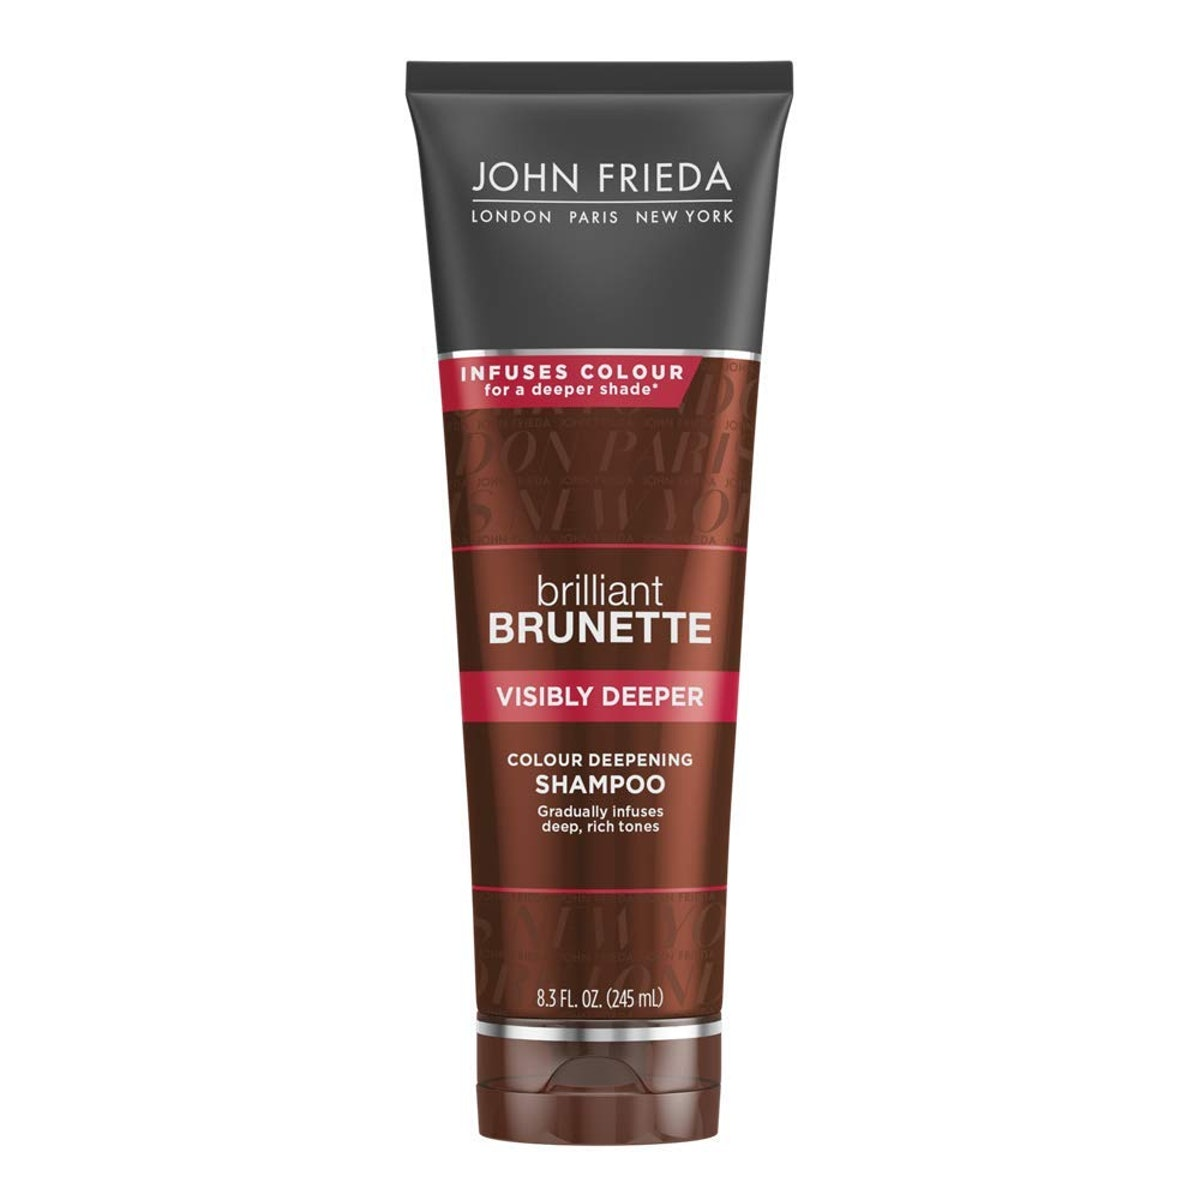 John Frieda Brilliant Brunette Color Deepening Shampoo